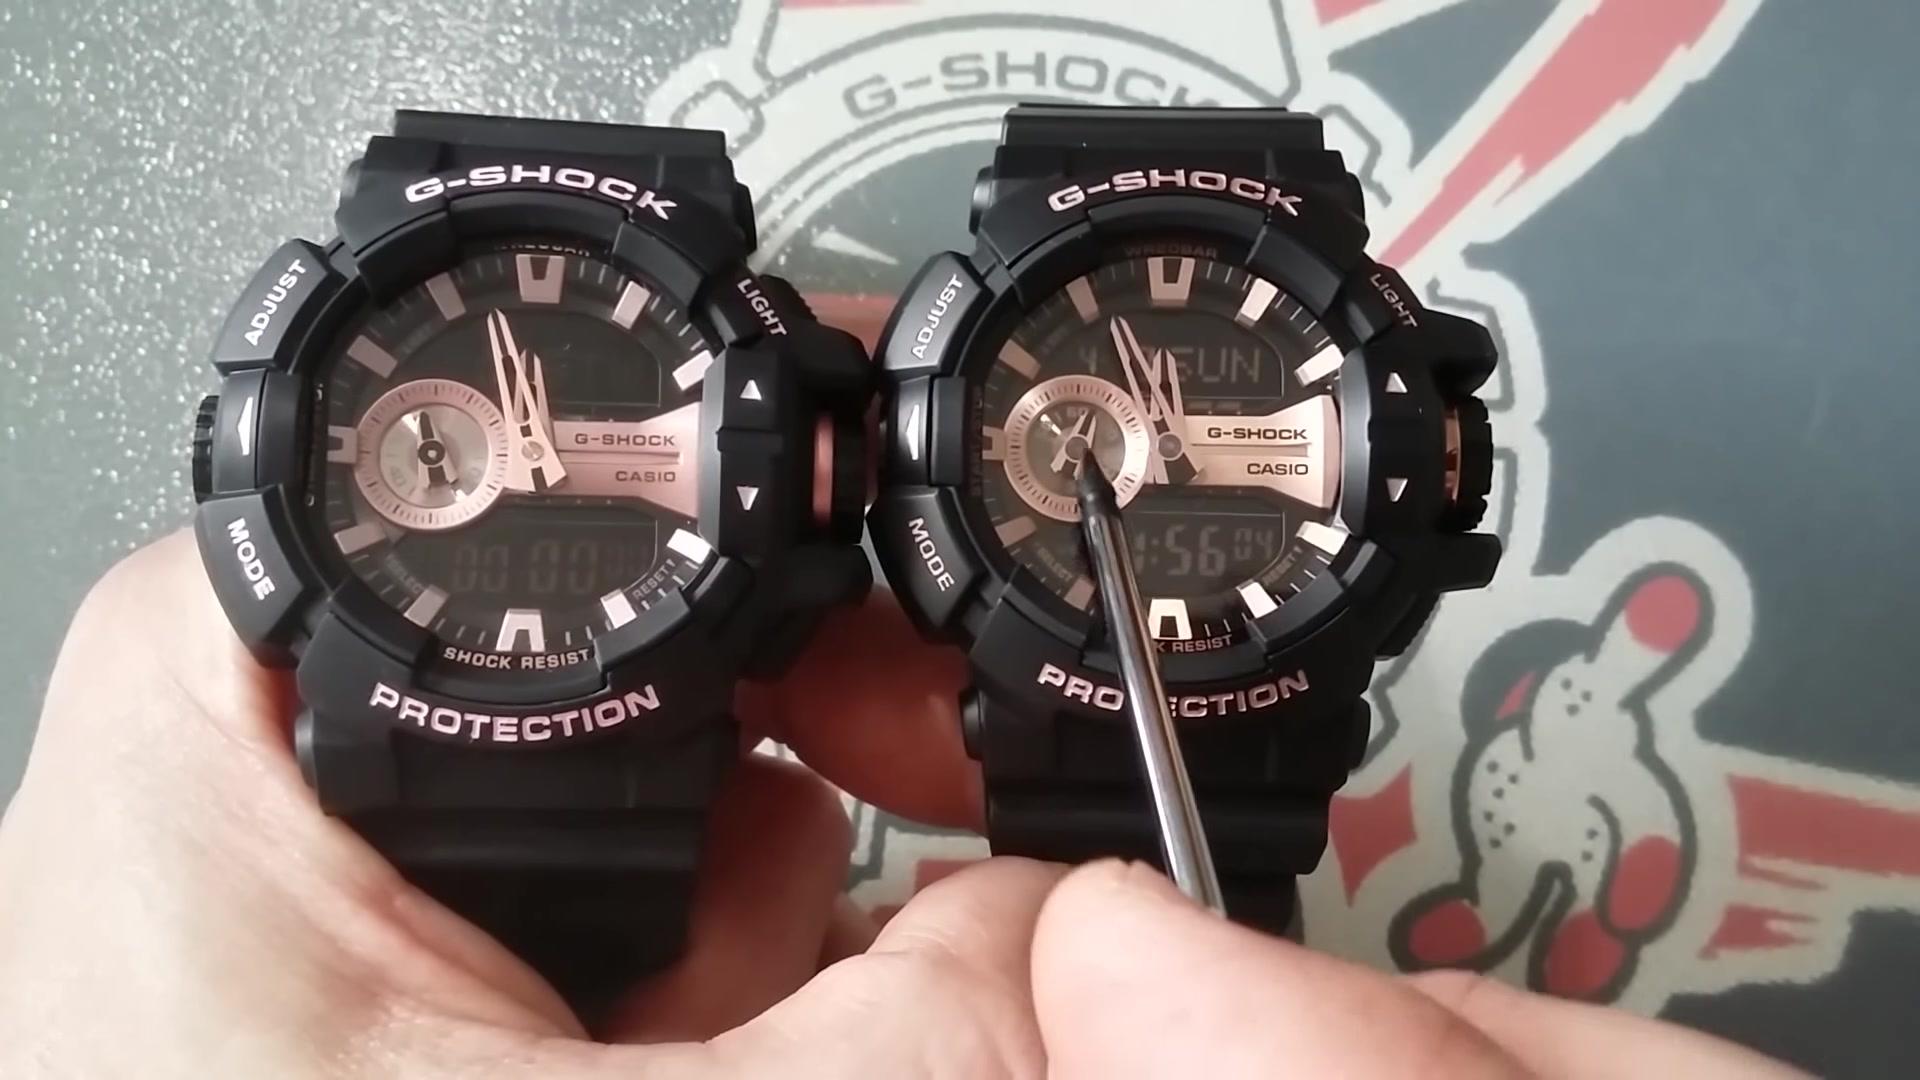 cach-phan-biet-dong-ho-g-shock-chinh-hang-va-g-shock-fake-hop-GA-400-replica-G-Shock-GA-400-real